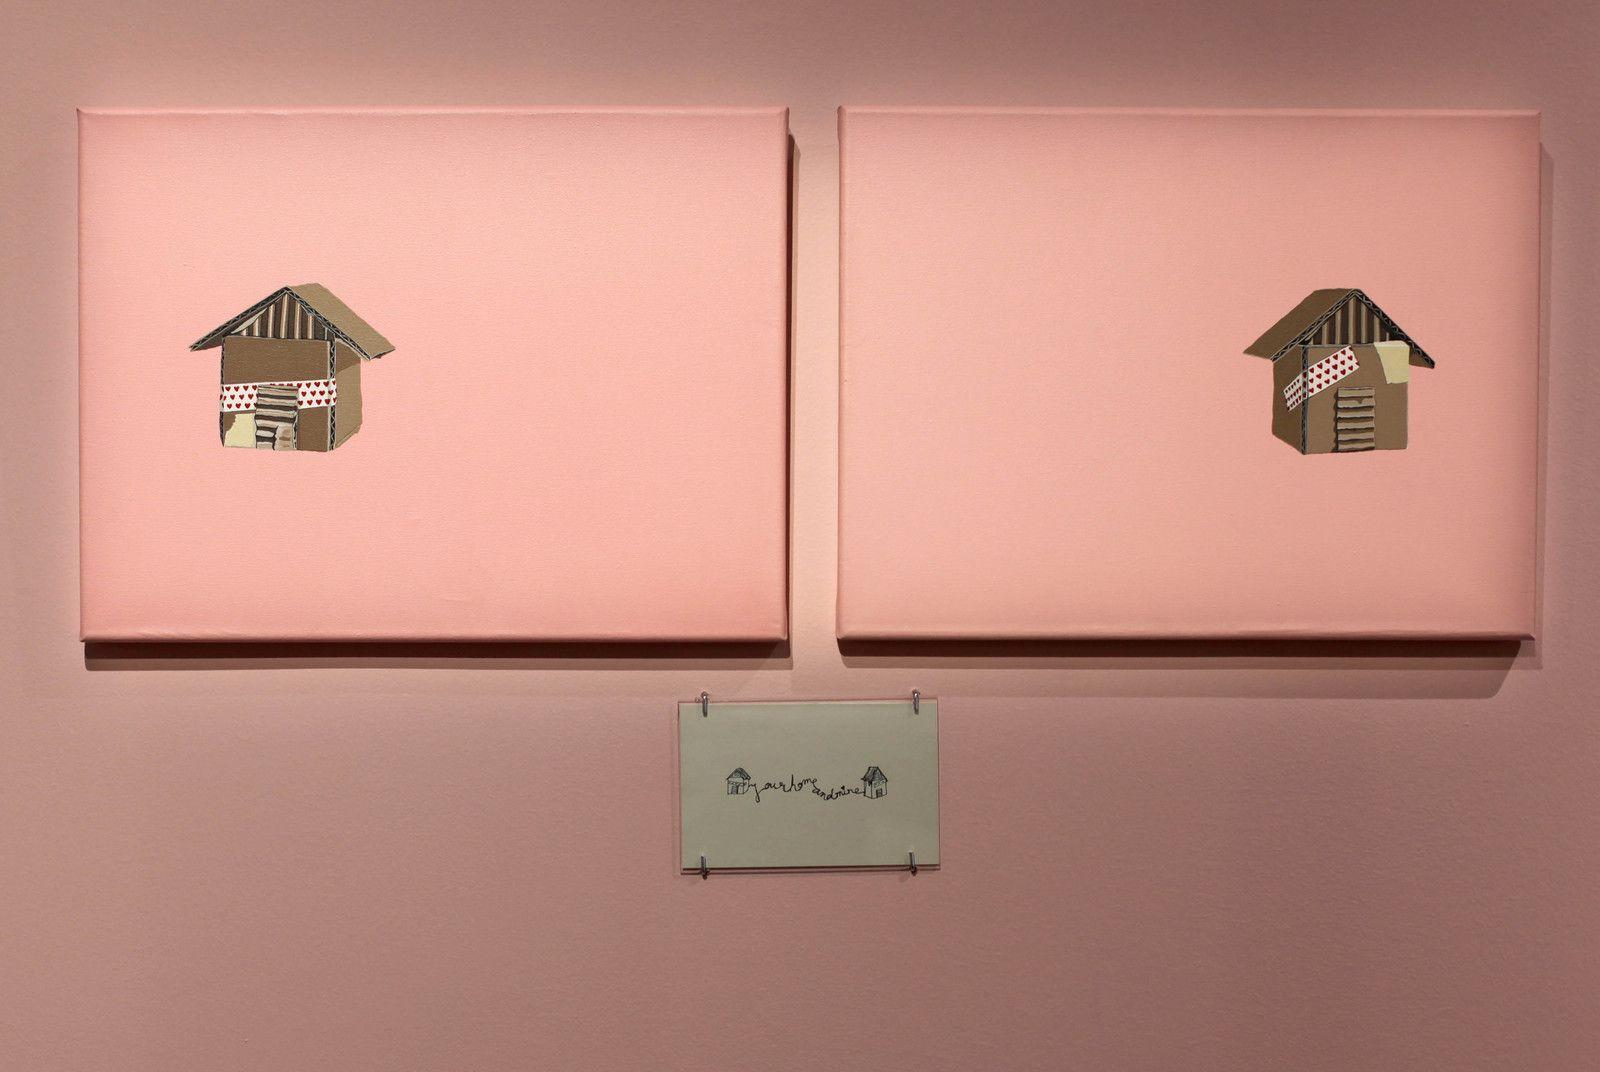 """Tu casa y la mia"", 2013 de Ronda BAUTISTA - Courtesy de l'artiste © Photo Éric Simon"